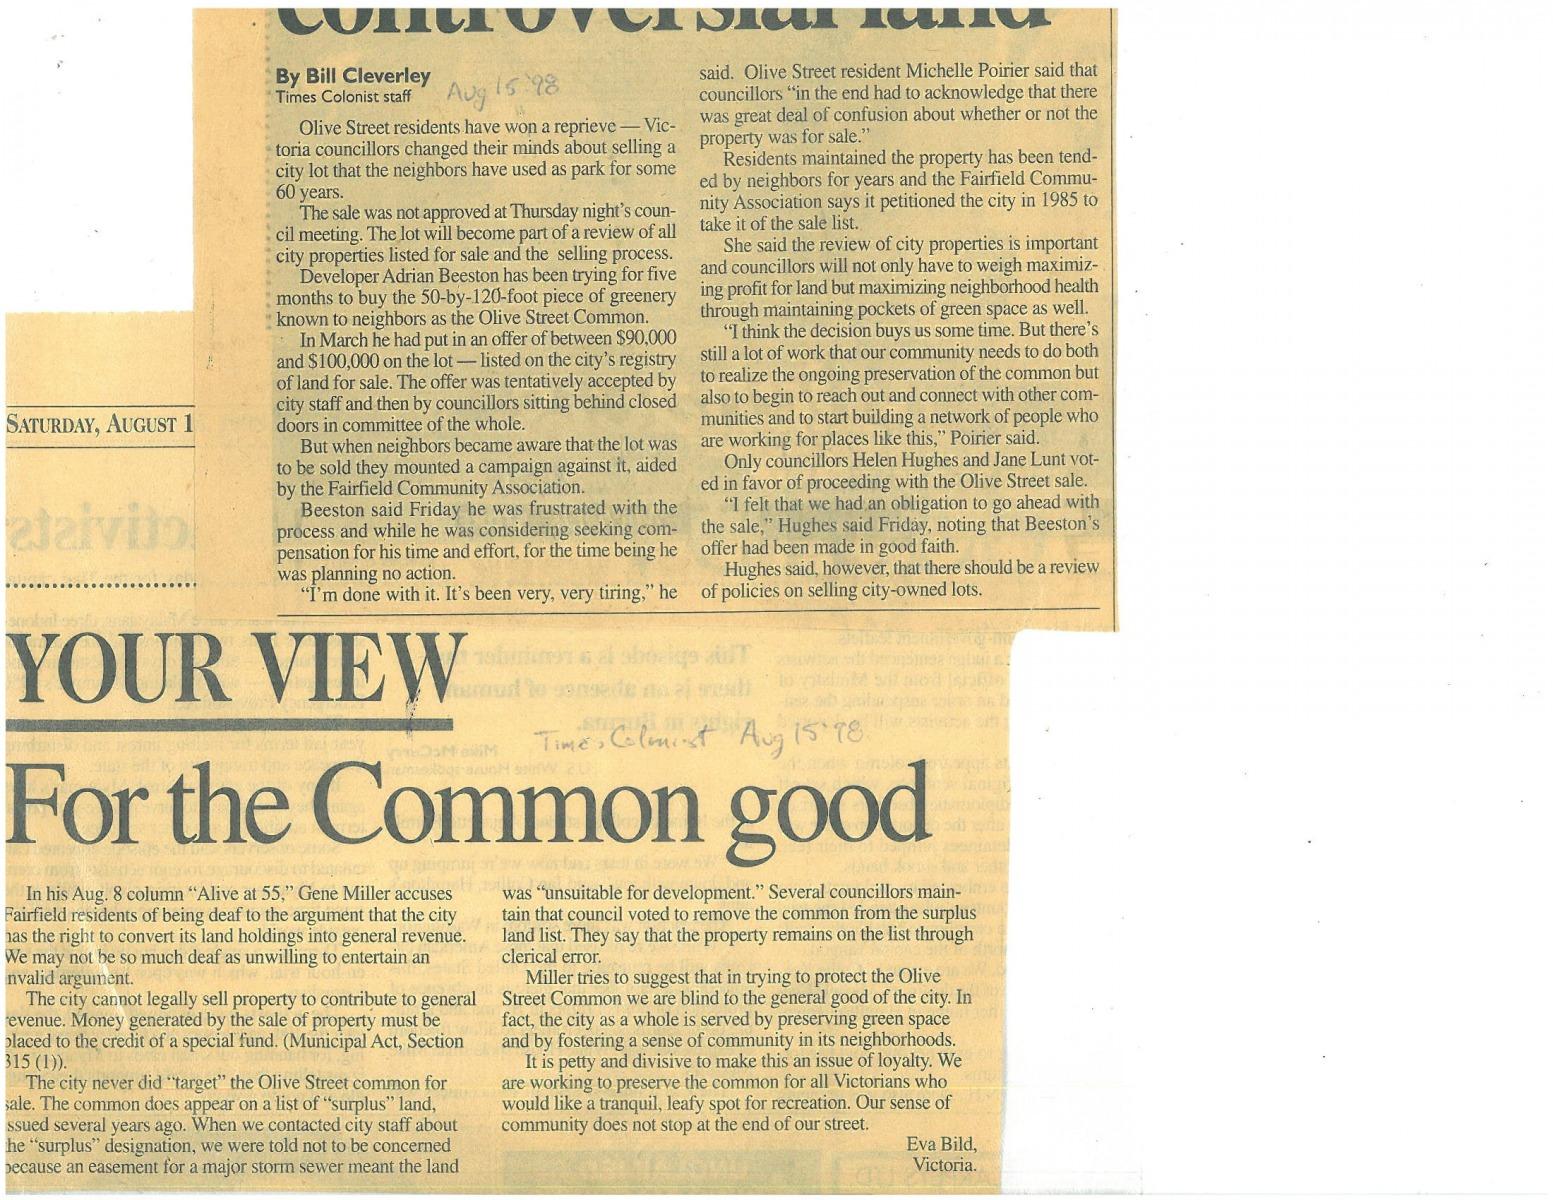 Aug-15-1998-City-Changes-Mind-For-the-Common-Good-Eva-Bild-letter-Times-Colonist-RESCAN-1